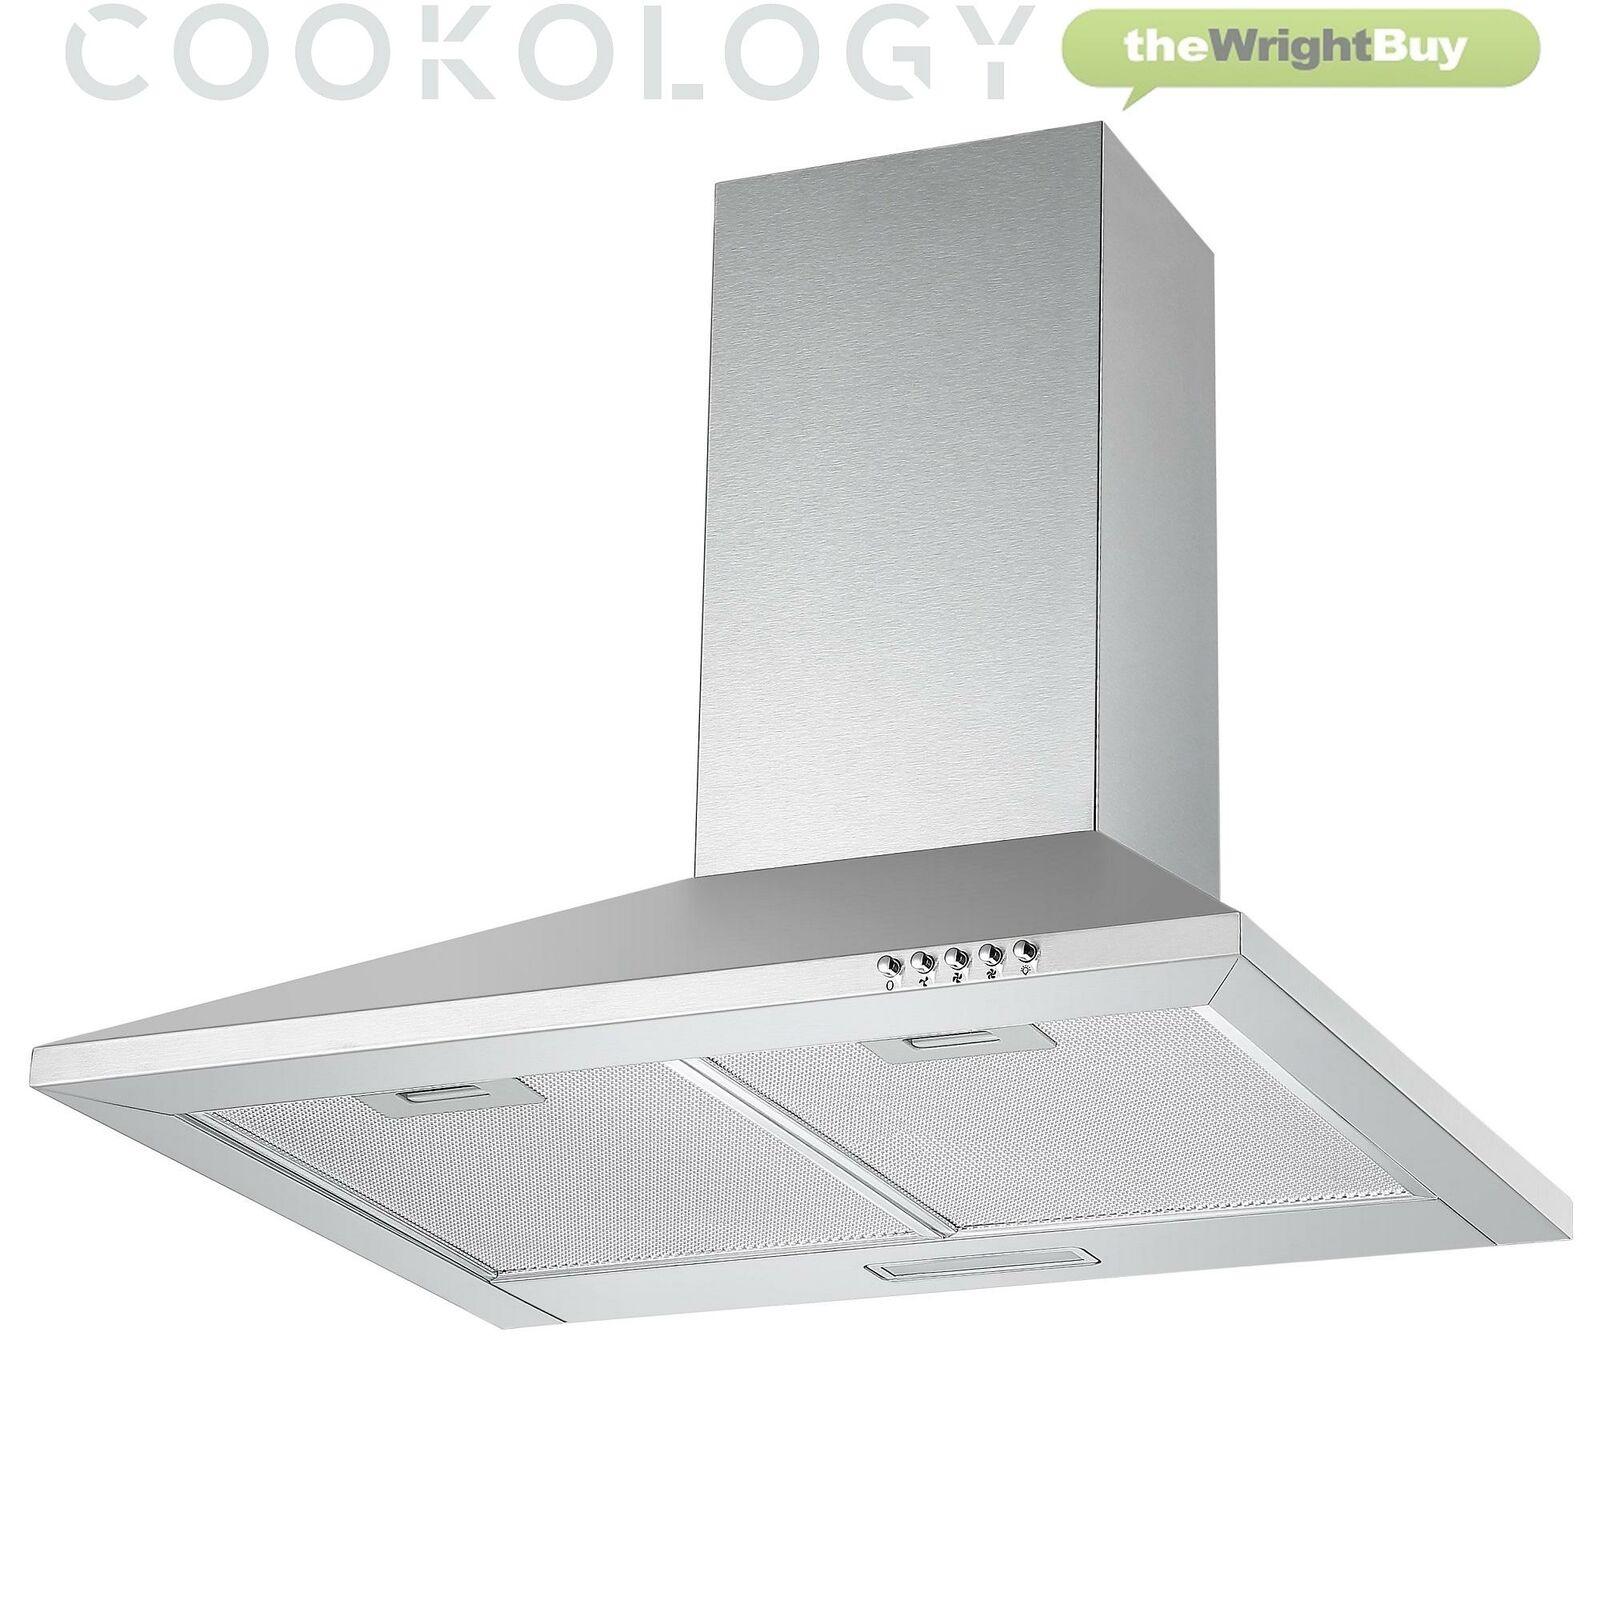 Cookology CH600SS Extractor Fan 60cm Cooker Hood £41.59 Using Code @ thewrightbuyltd / eBay